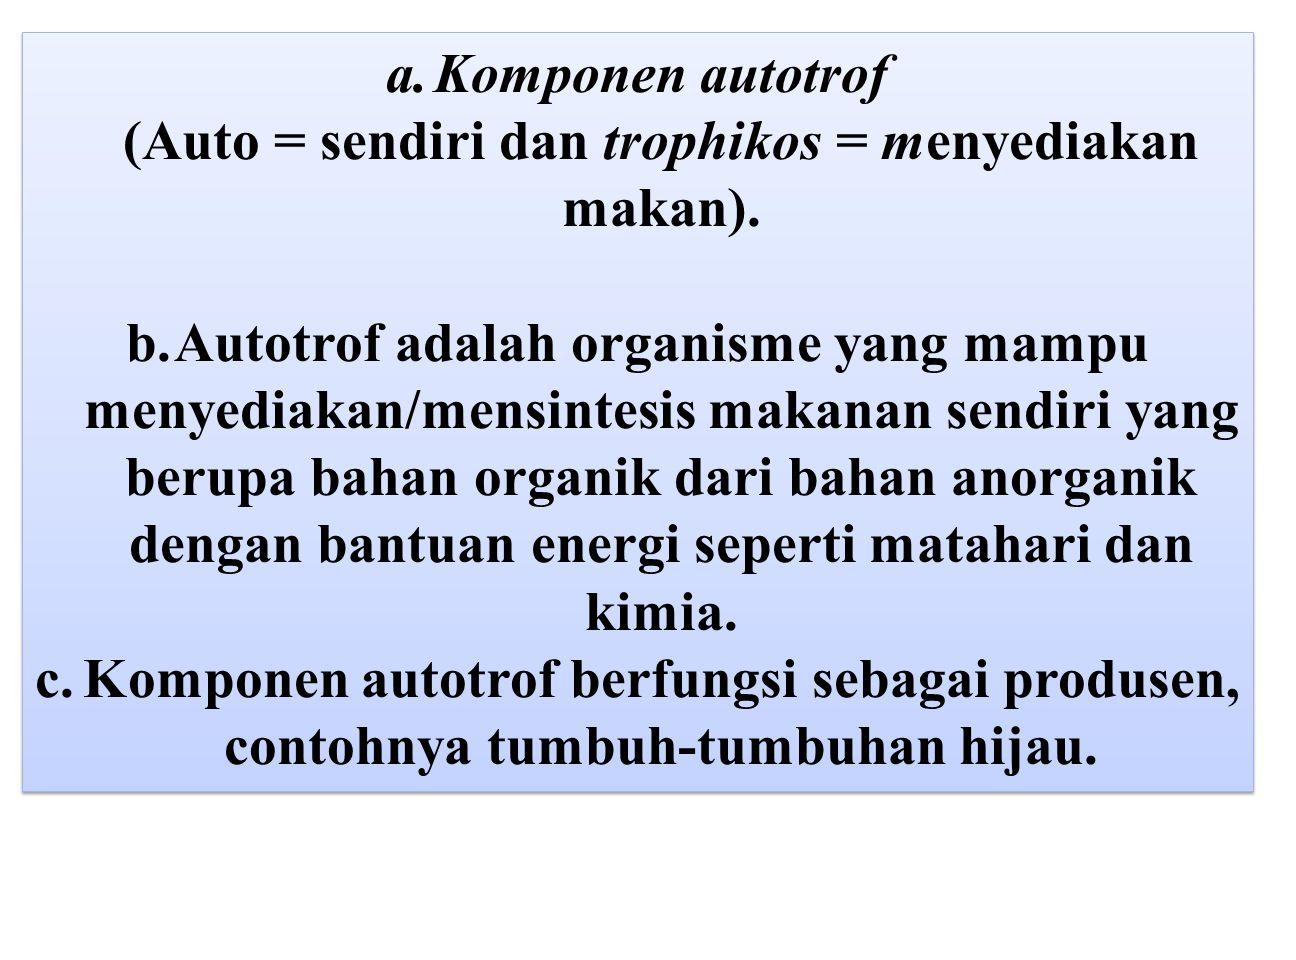 a.Komponen autotrof (Auto = sendiri dan trophikos = menyediakan makan). b.Autotrof adalah organisme yang mampu menyediakan/mensintesis makanan sendiri